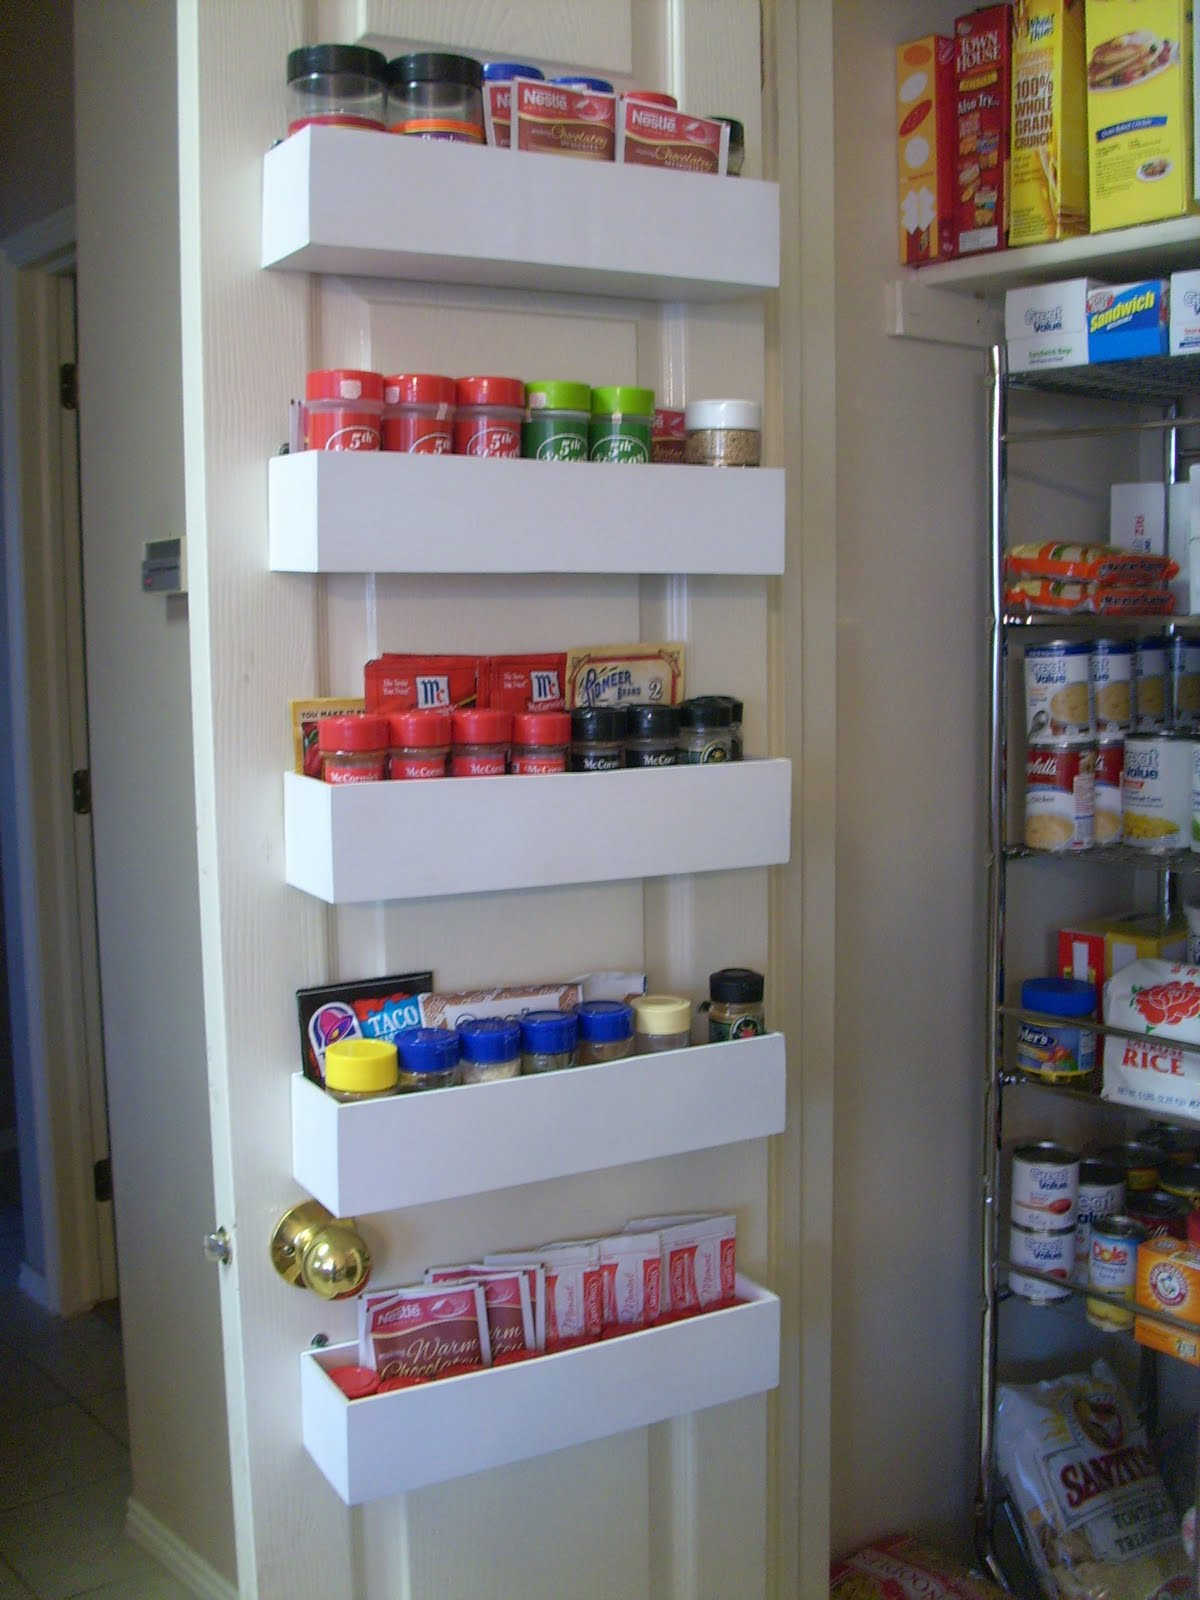 Best ideas about Cabinet Door Spice Rack DIY . Save or Pin RobbyGurl s Creations DIY Pantry Door Spice Racks Now.